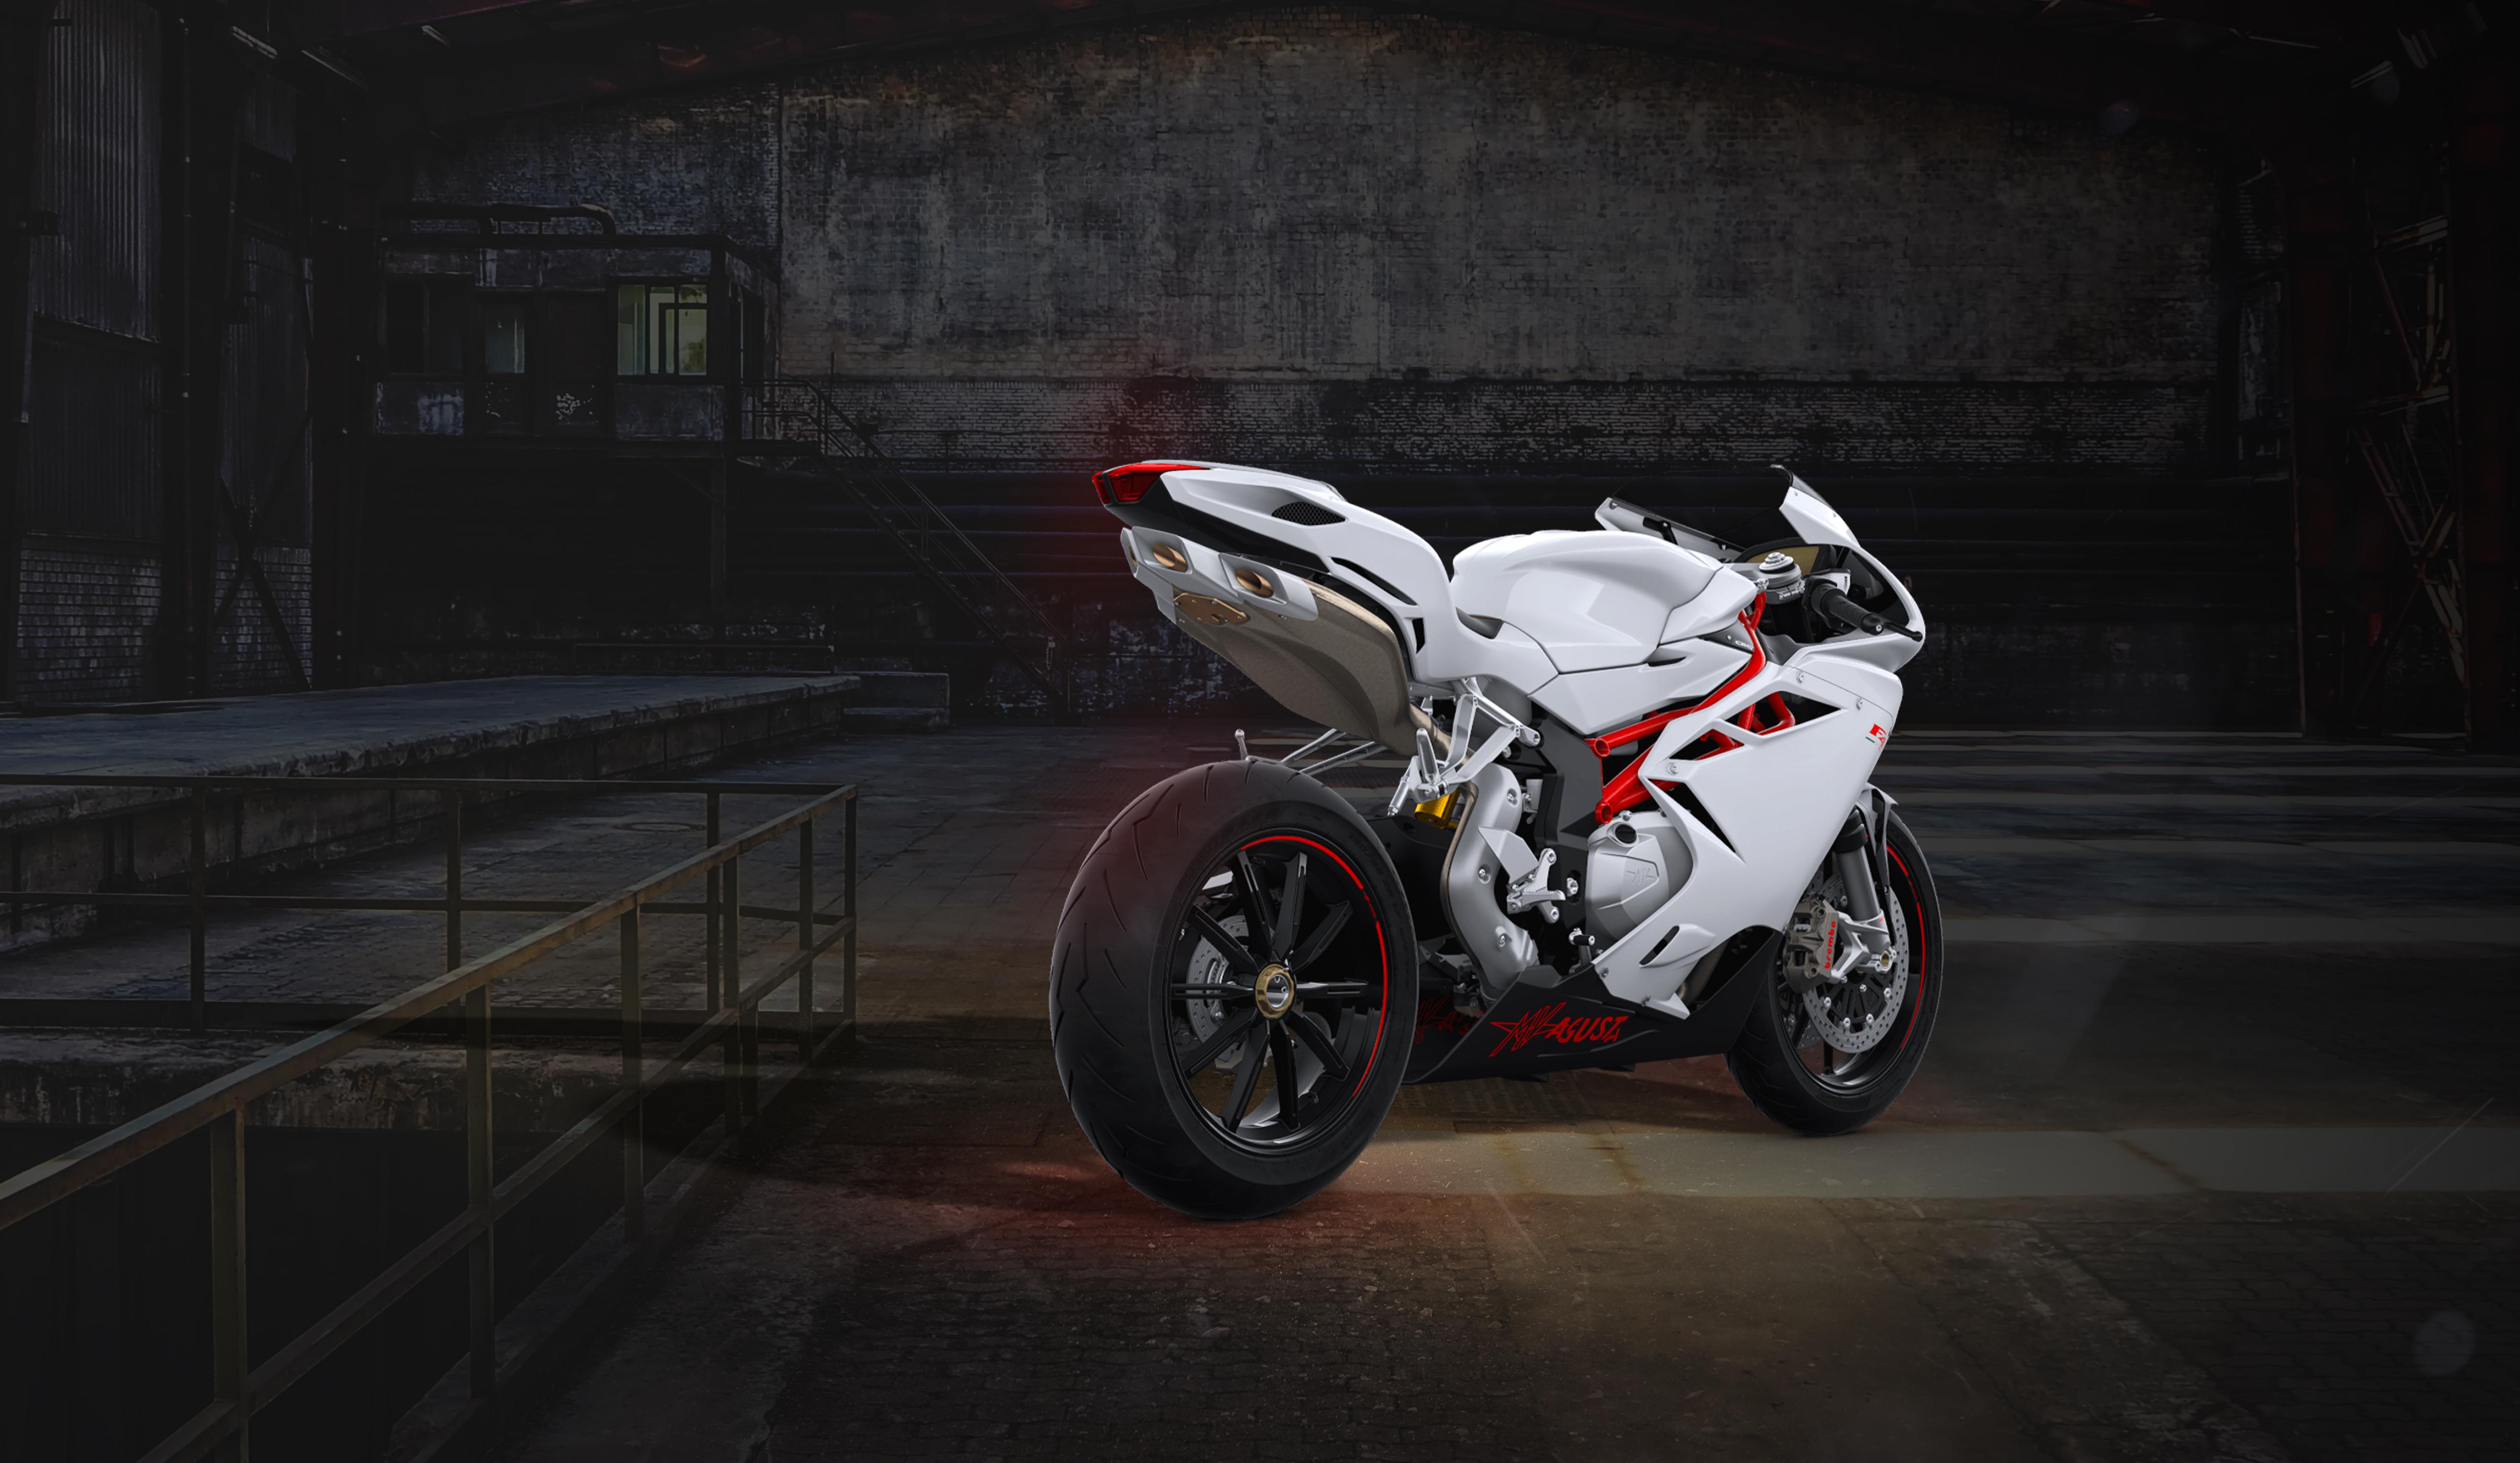 MV Agusta Australia 1000, HD Bikes, 4k Wallpapers, Images